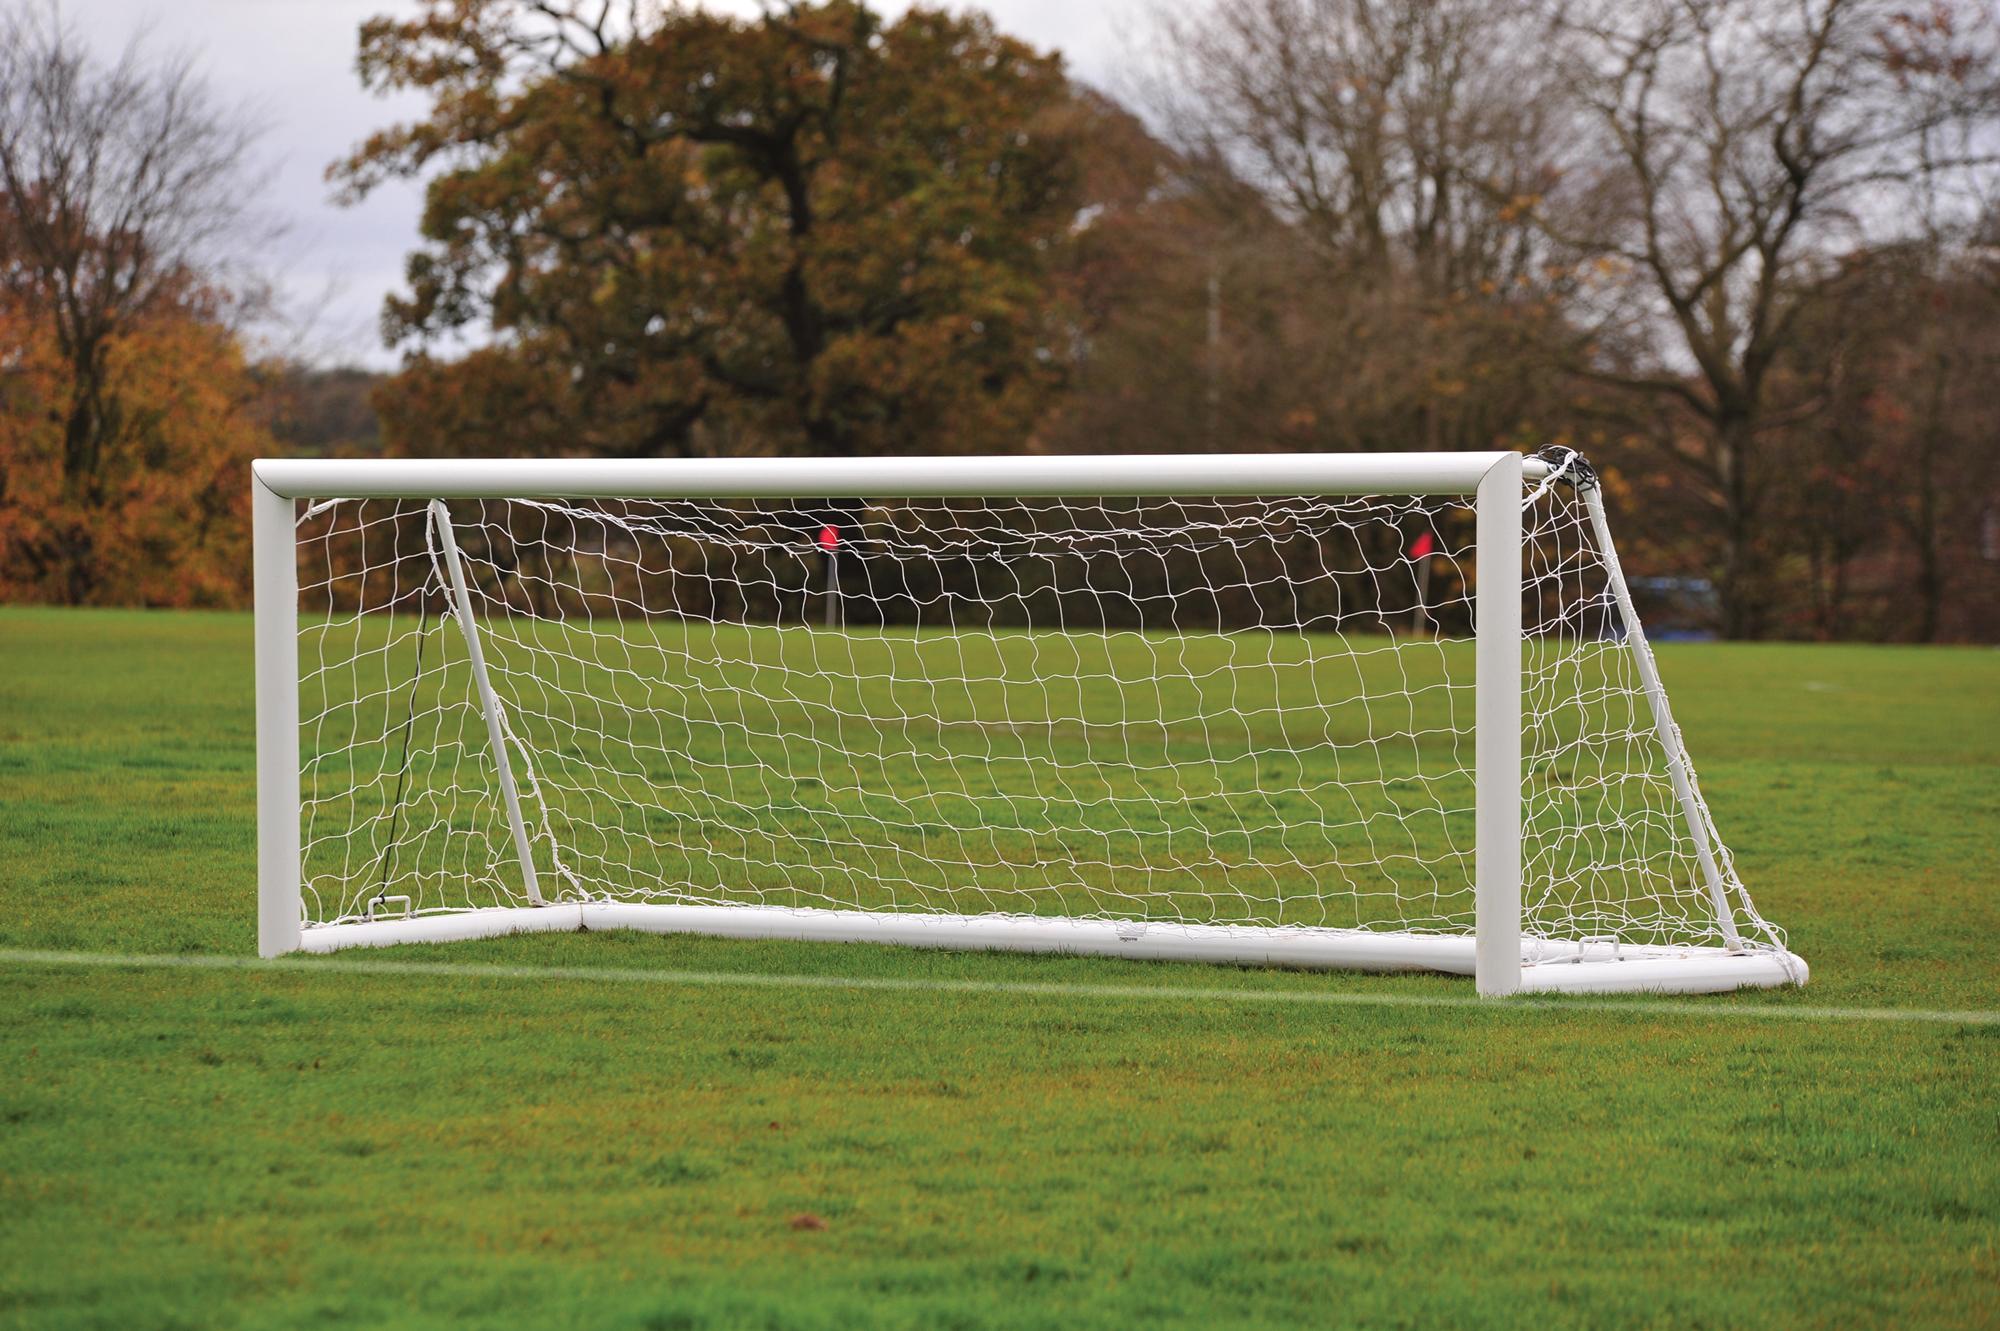 Freestanding Elliptical Aluminium Football Goals Package - 12' x 4'